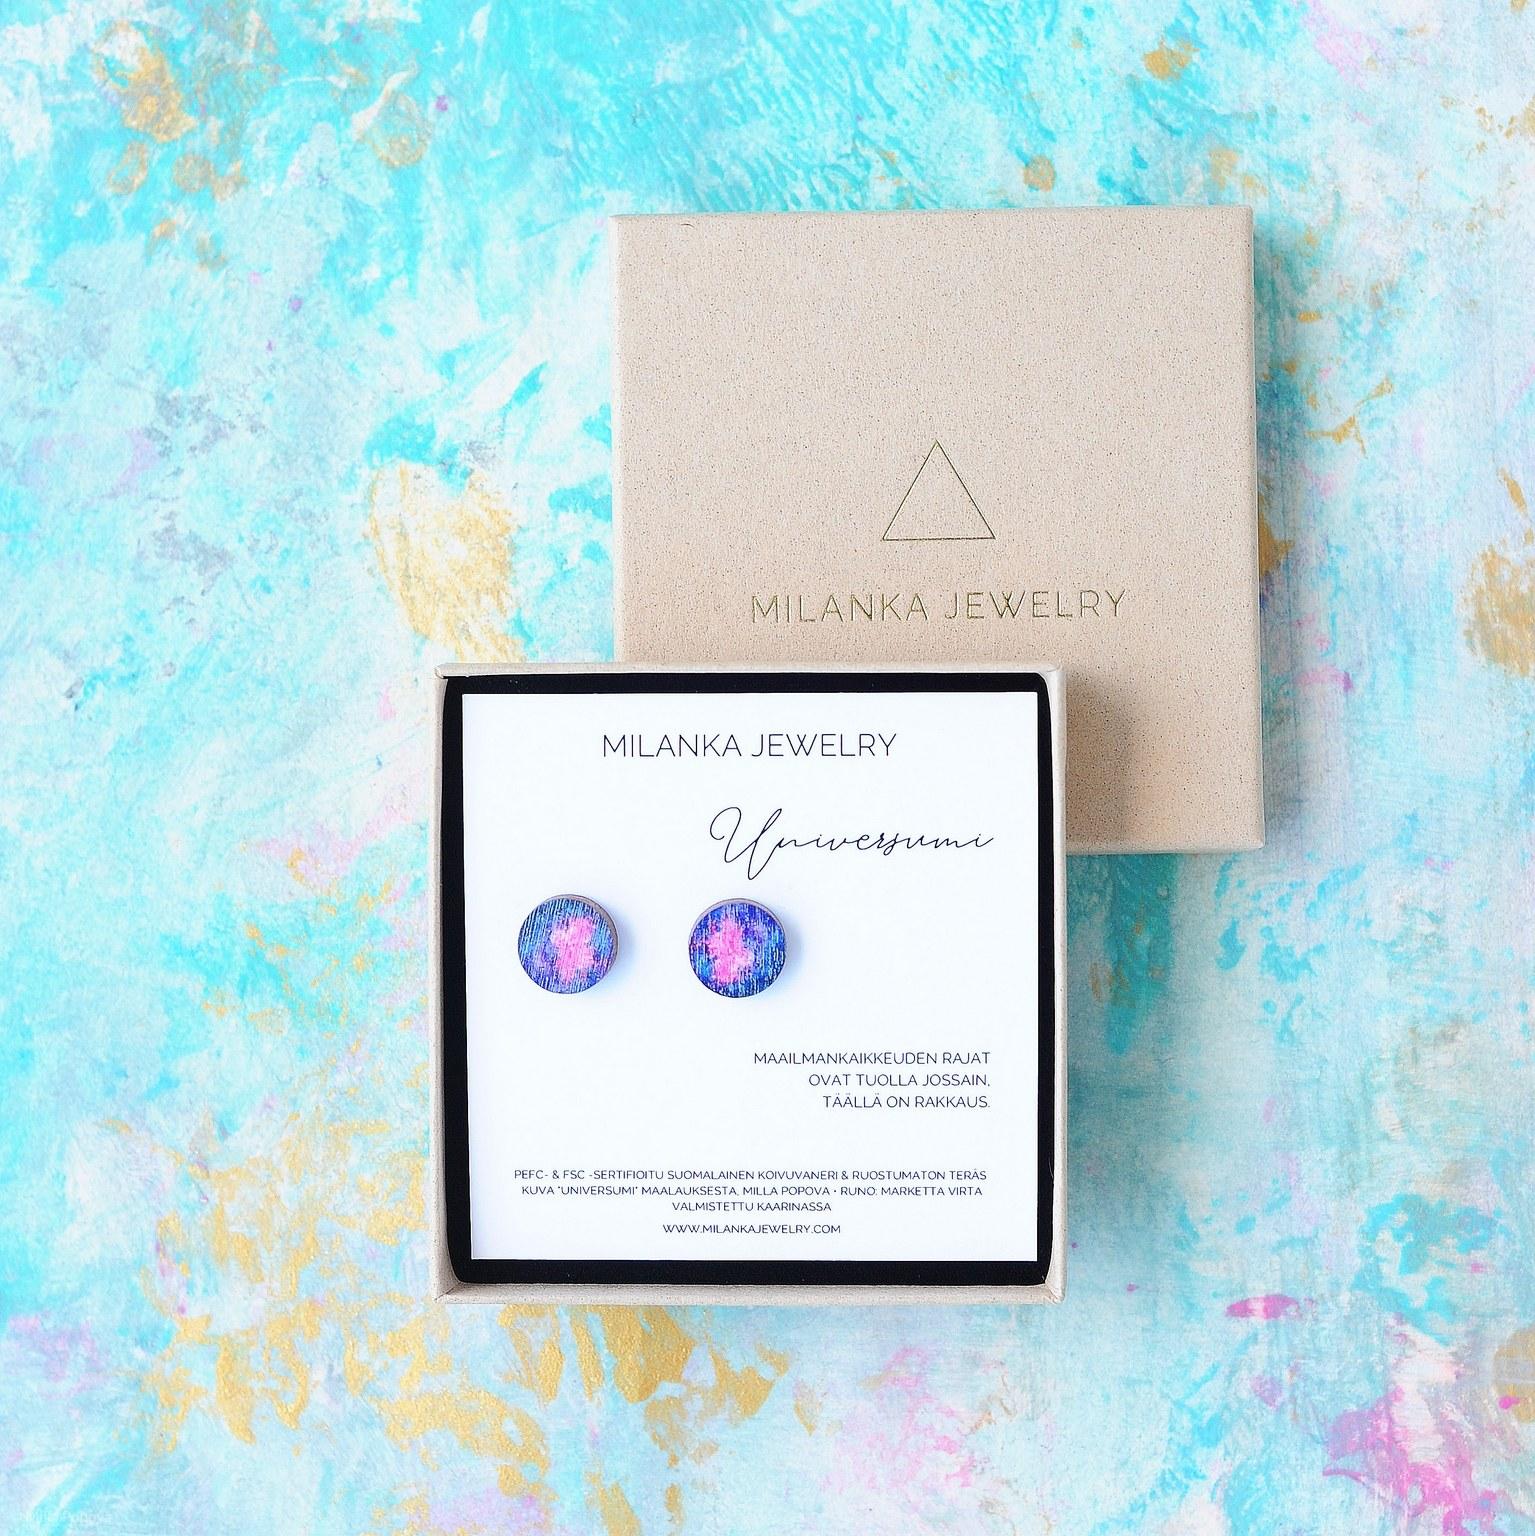 Milanka Jewelry: Universumi-tappikorvikset